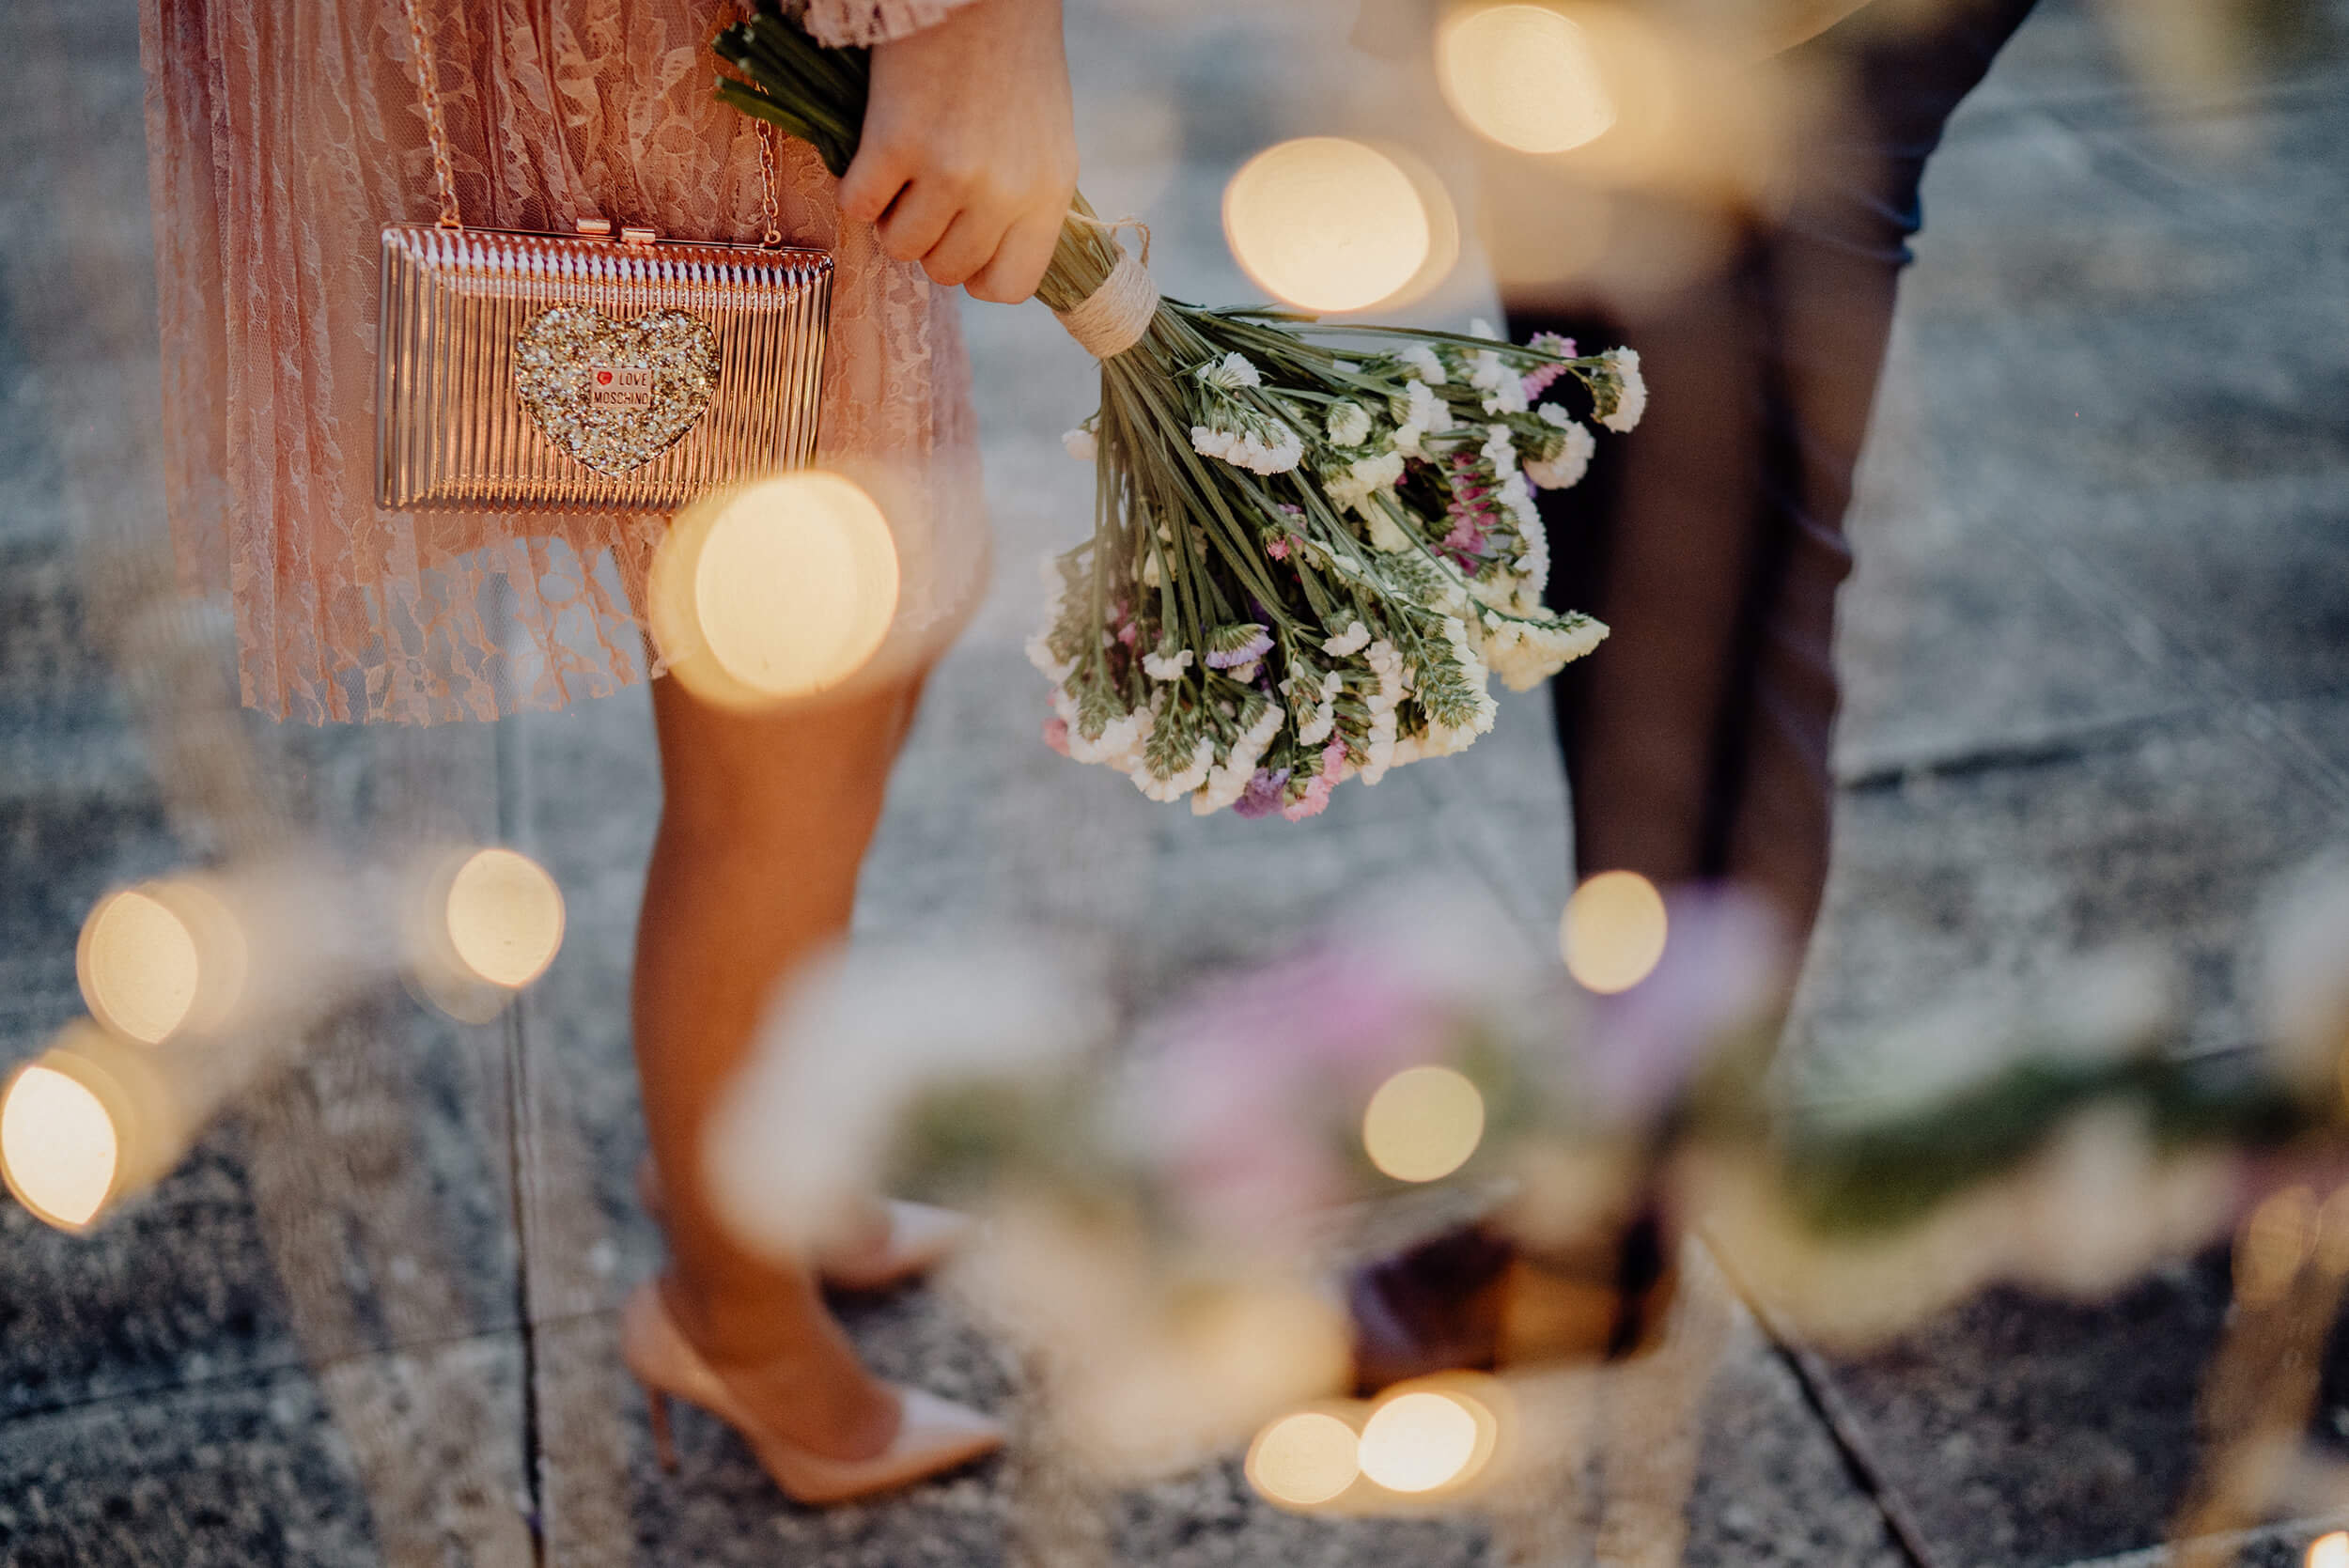 roma-organizacao-eventos-pedido-de-casamento-no-porto-43